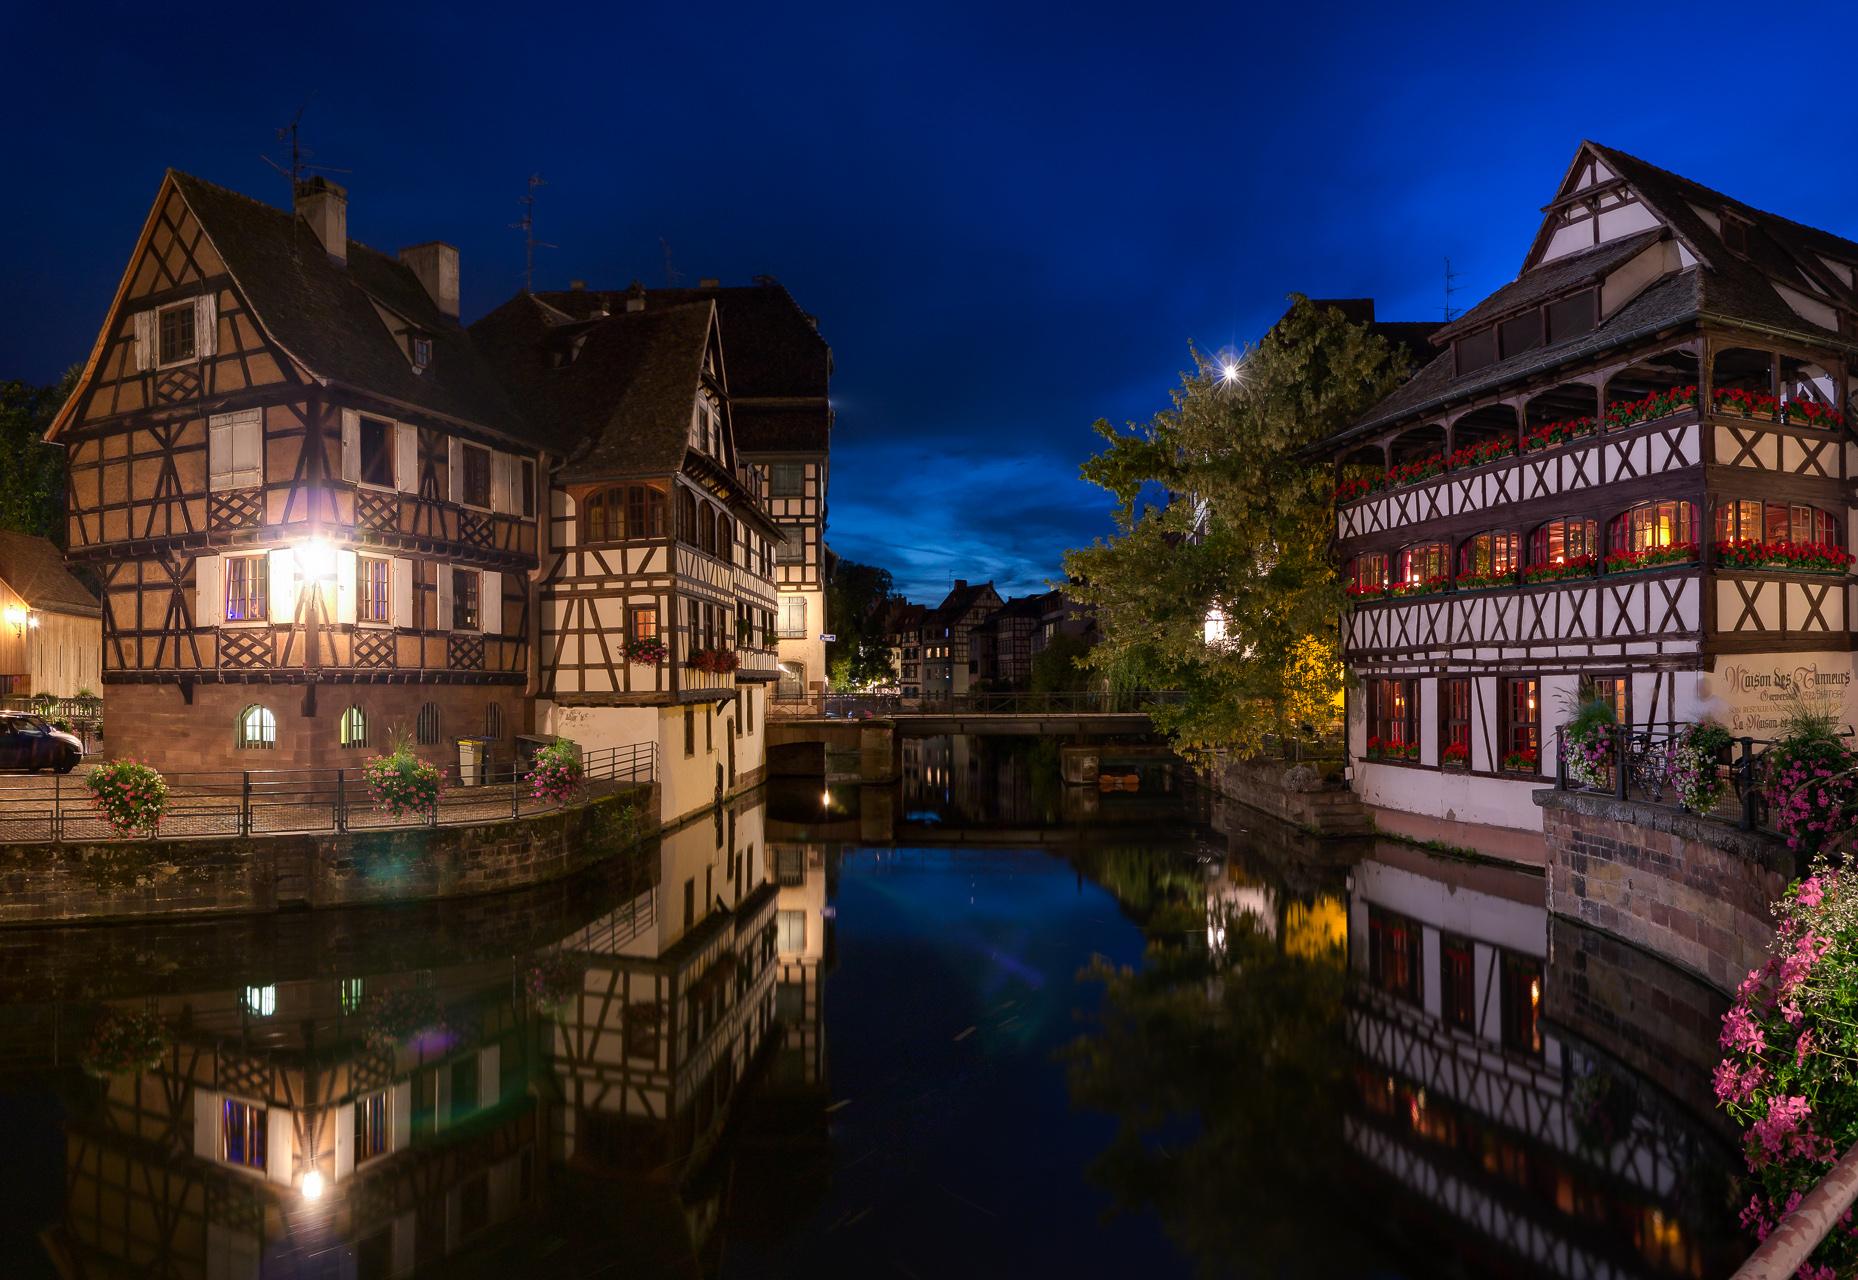 La_Petit_France_at_night_Strasbourg_France